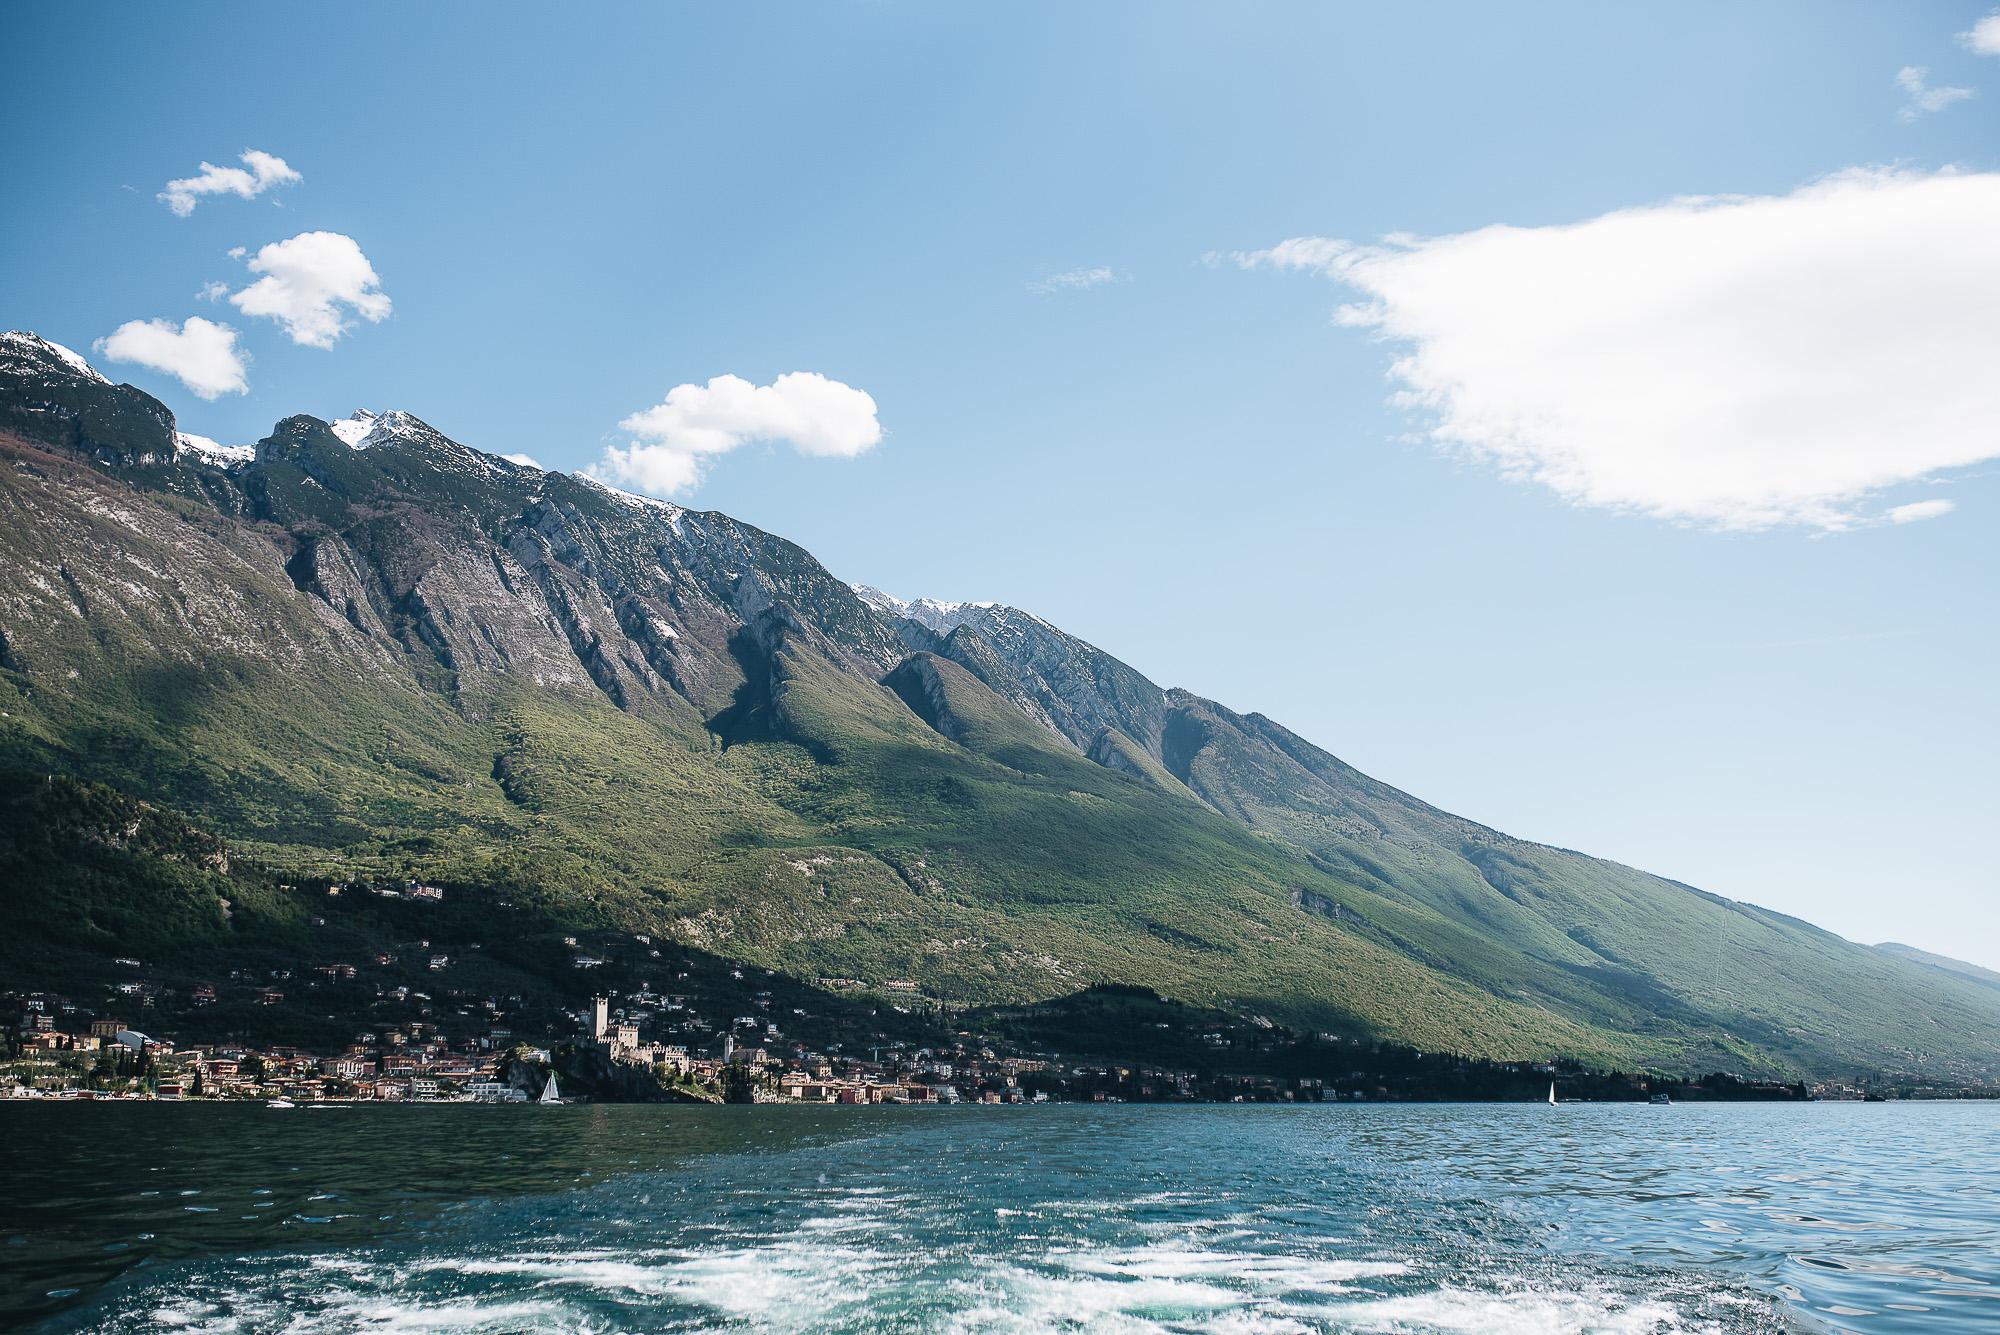 OurBeautifulAdventure-LakeGarda-Italy-Blog-1255.jpg